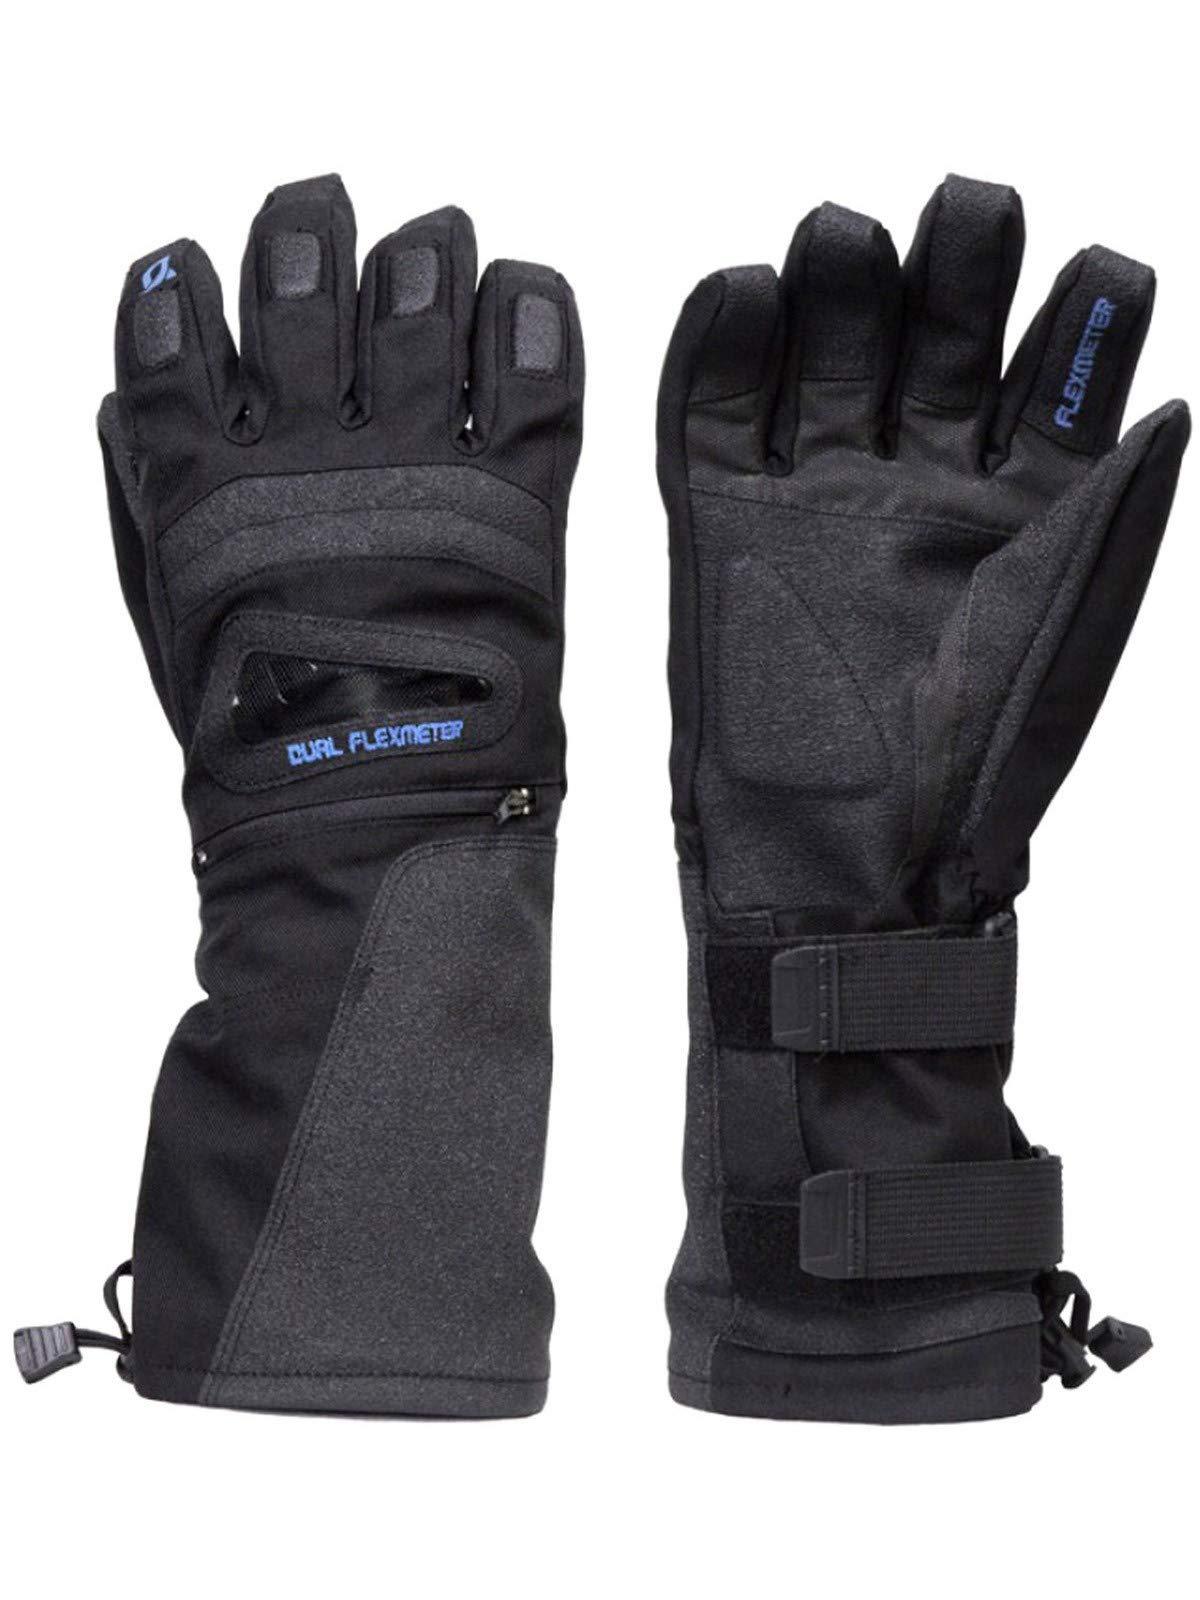 Flexmeter Double Sided Wristguard Glove (Medium)